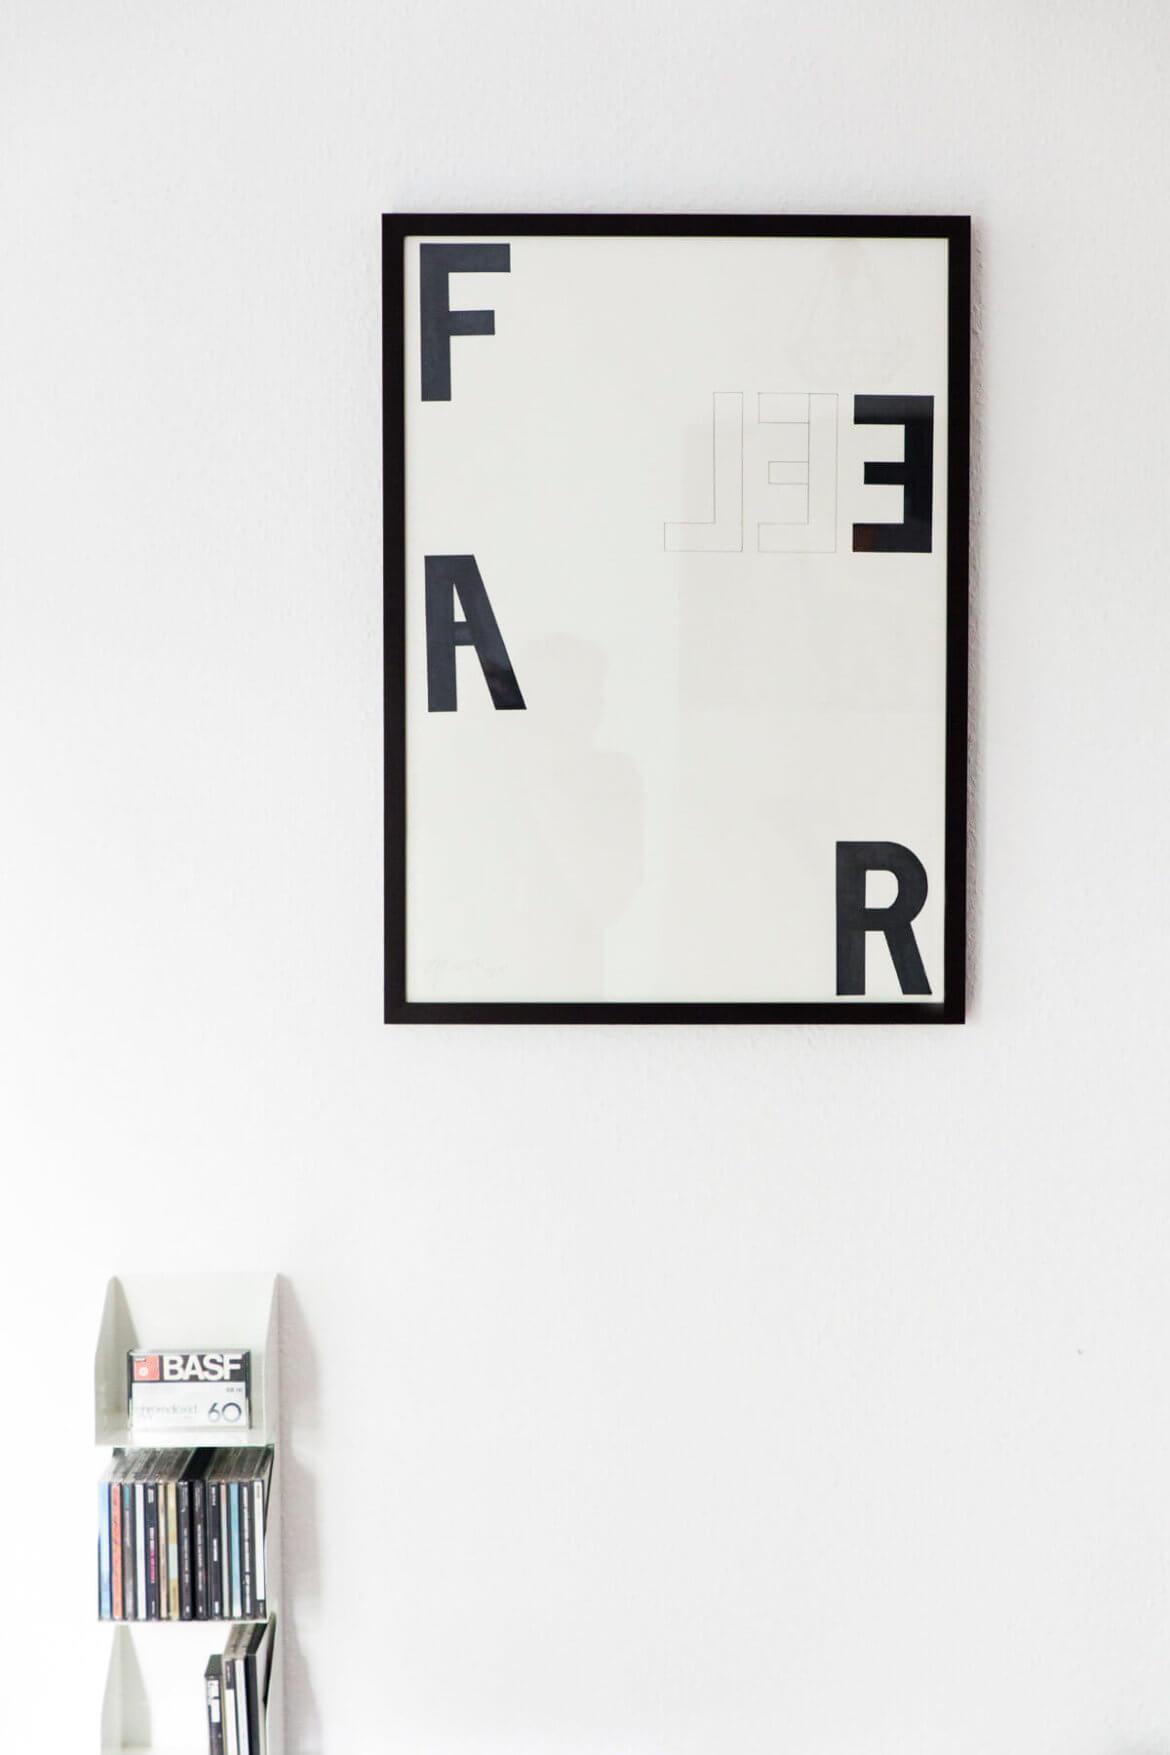 Daniel_Angermann_Fear_Far_Feel_2017_0_small Fear, Feel, Far